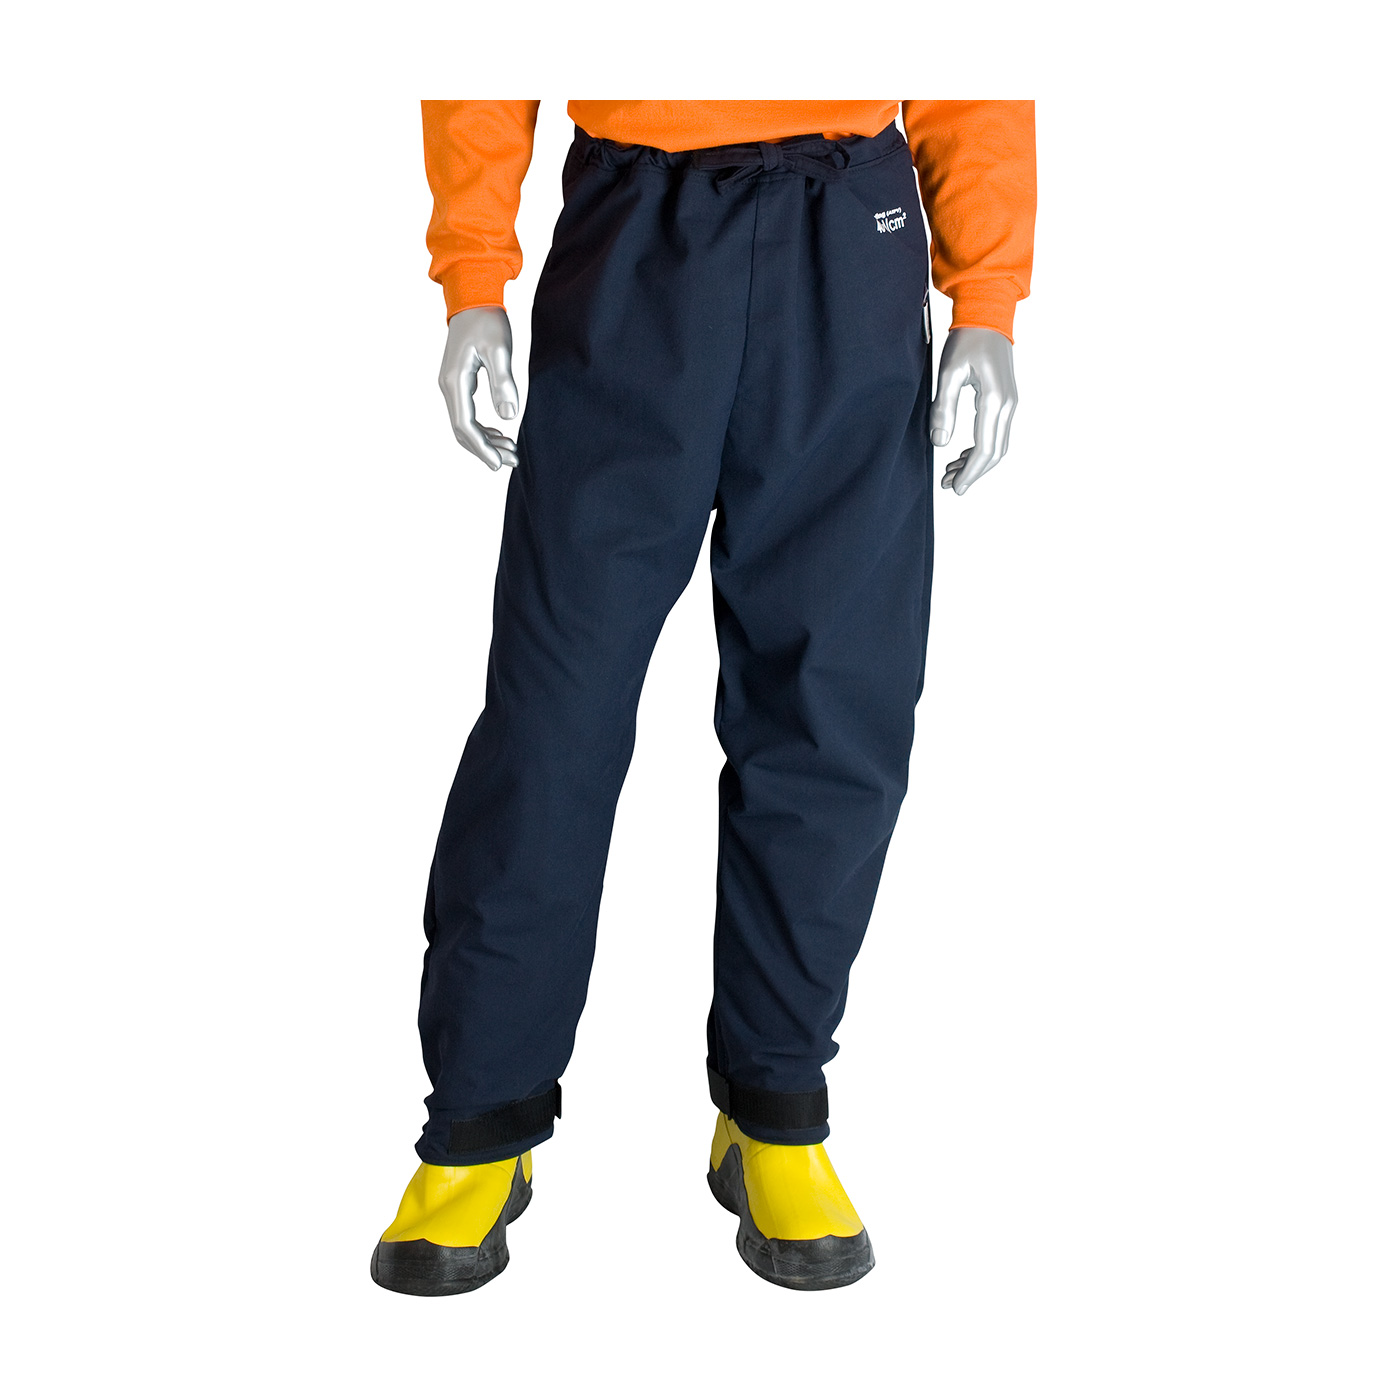 AR/FR Ultralight Pants - 40 Cal/cm2, Navy, L